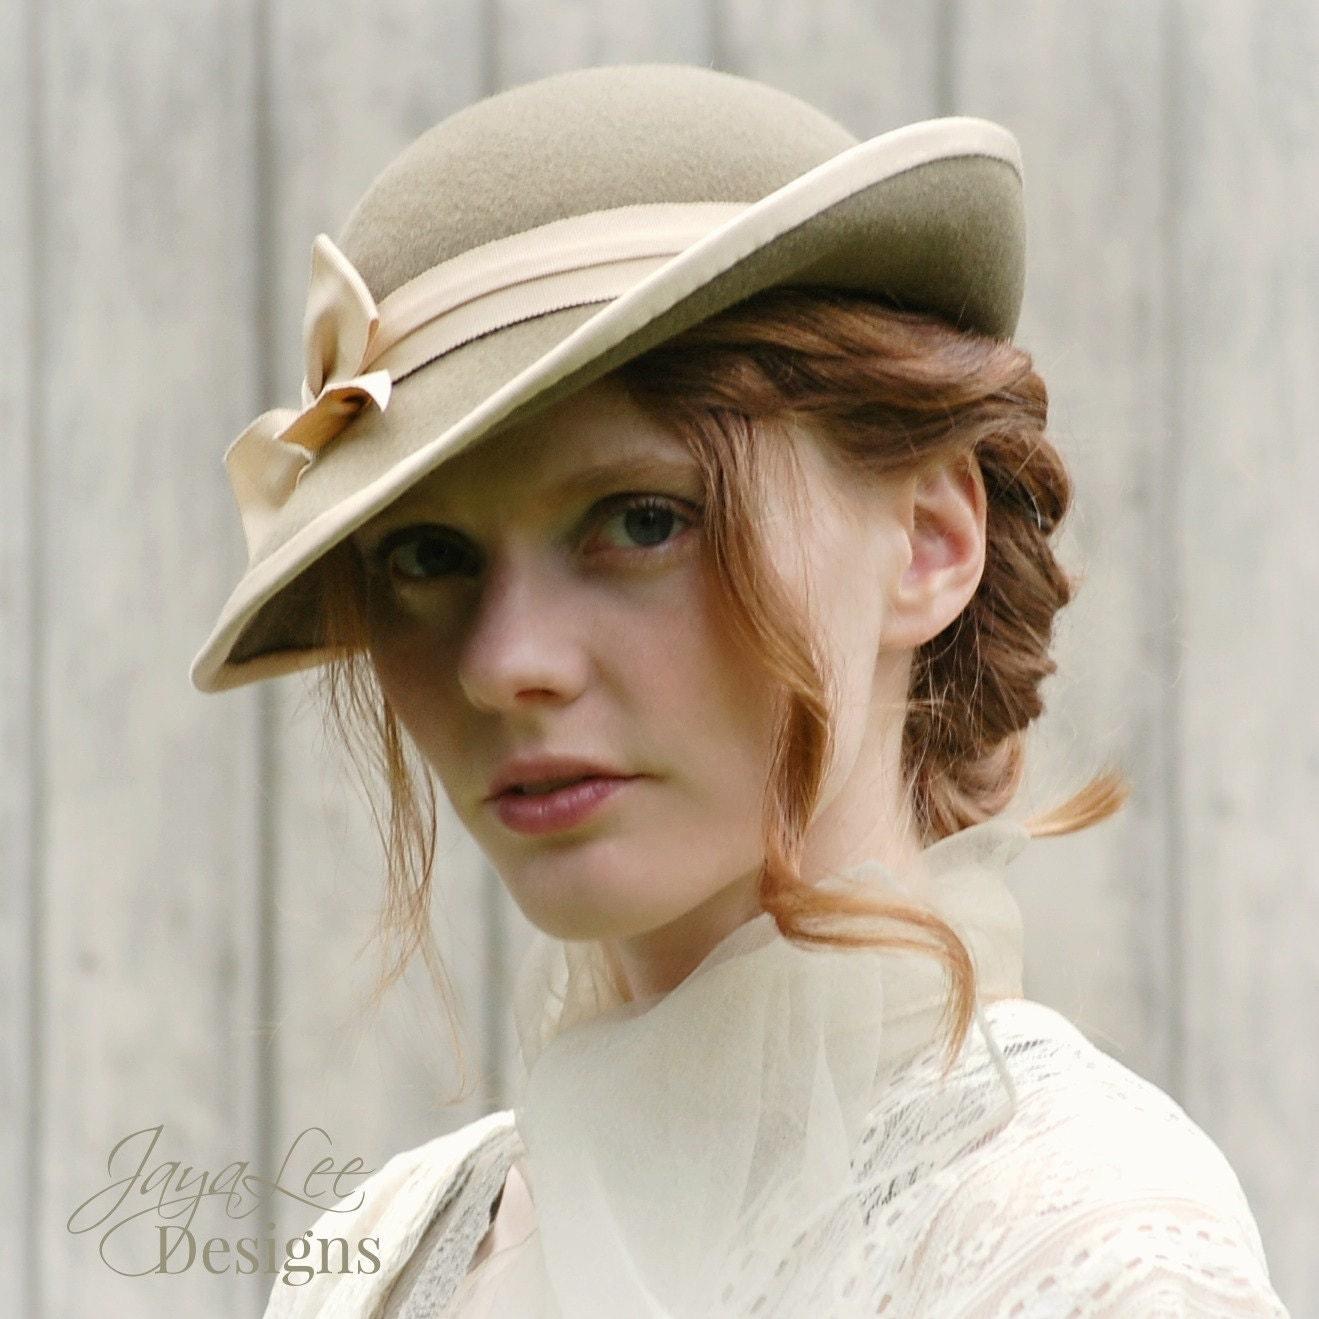 1930s vintage hats for women 1930s vintage hats for women